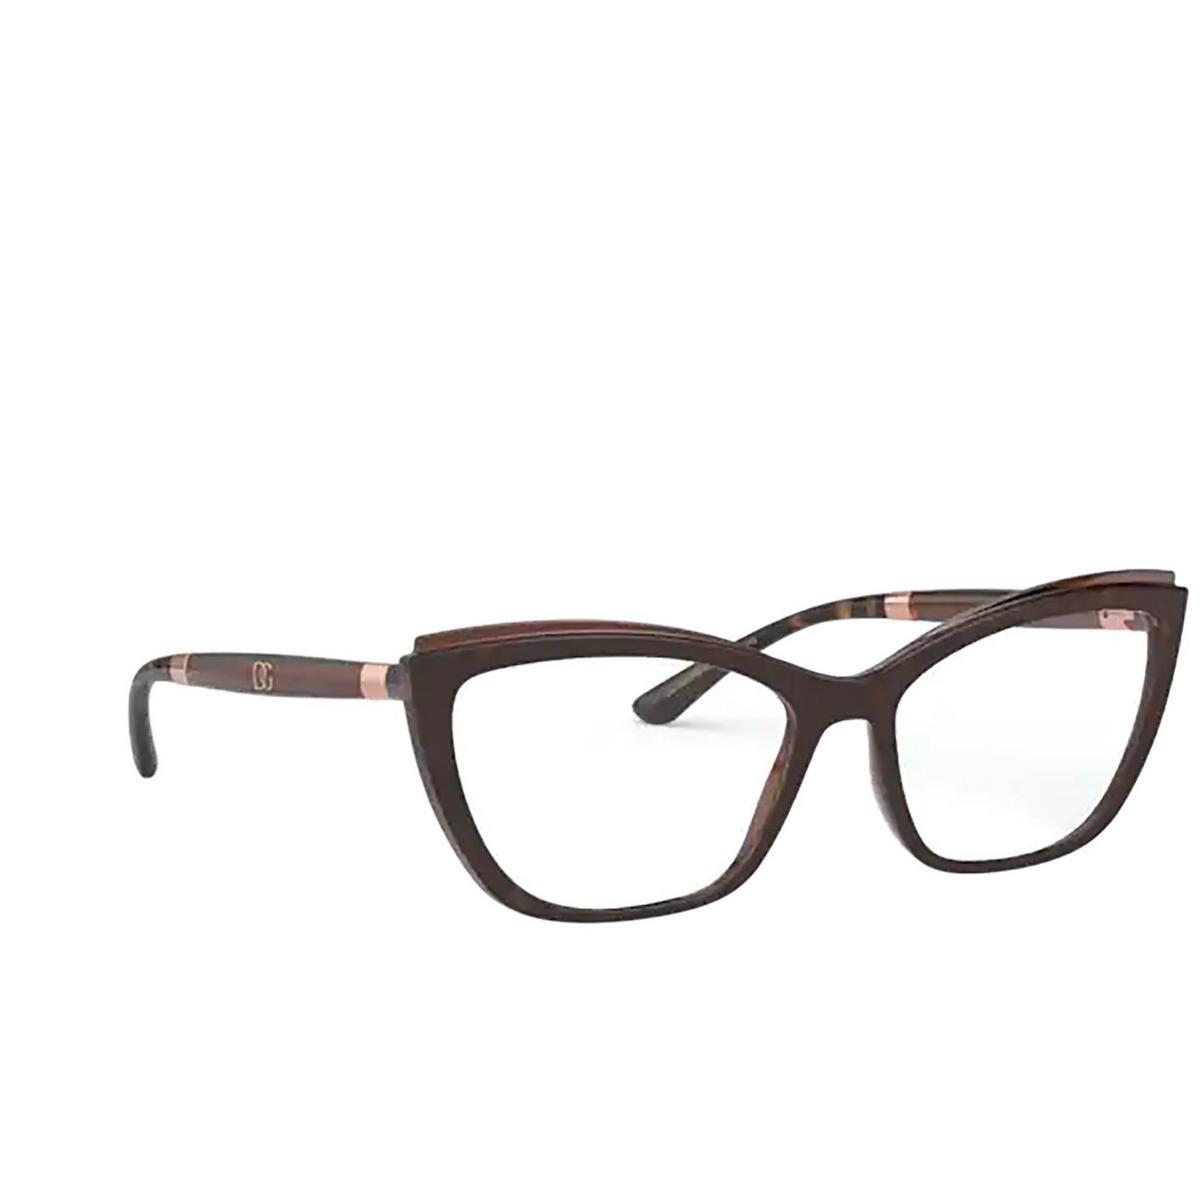 Dolce & Gabbana® Cat-eye Eyeglasses: DG5054 color Havana On Transparent Brown 3185 - three-quarters view.